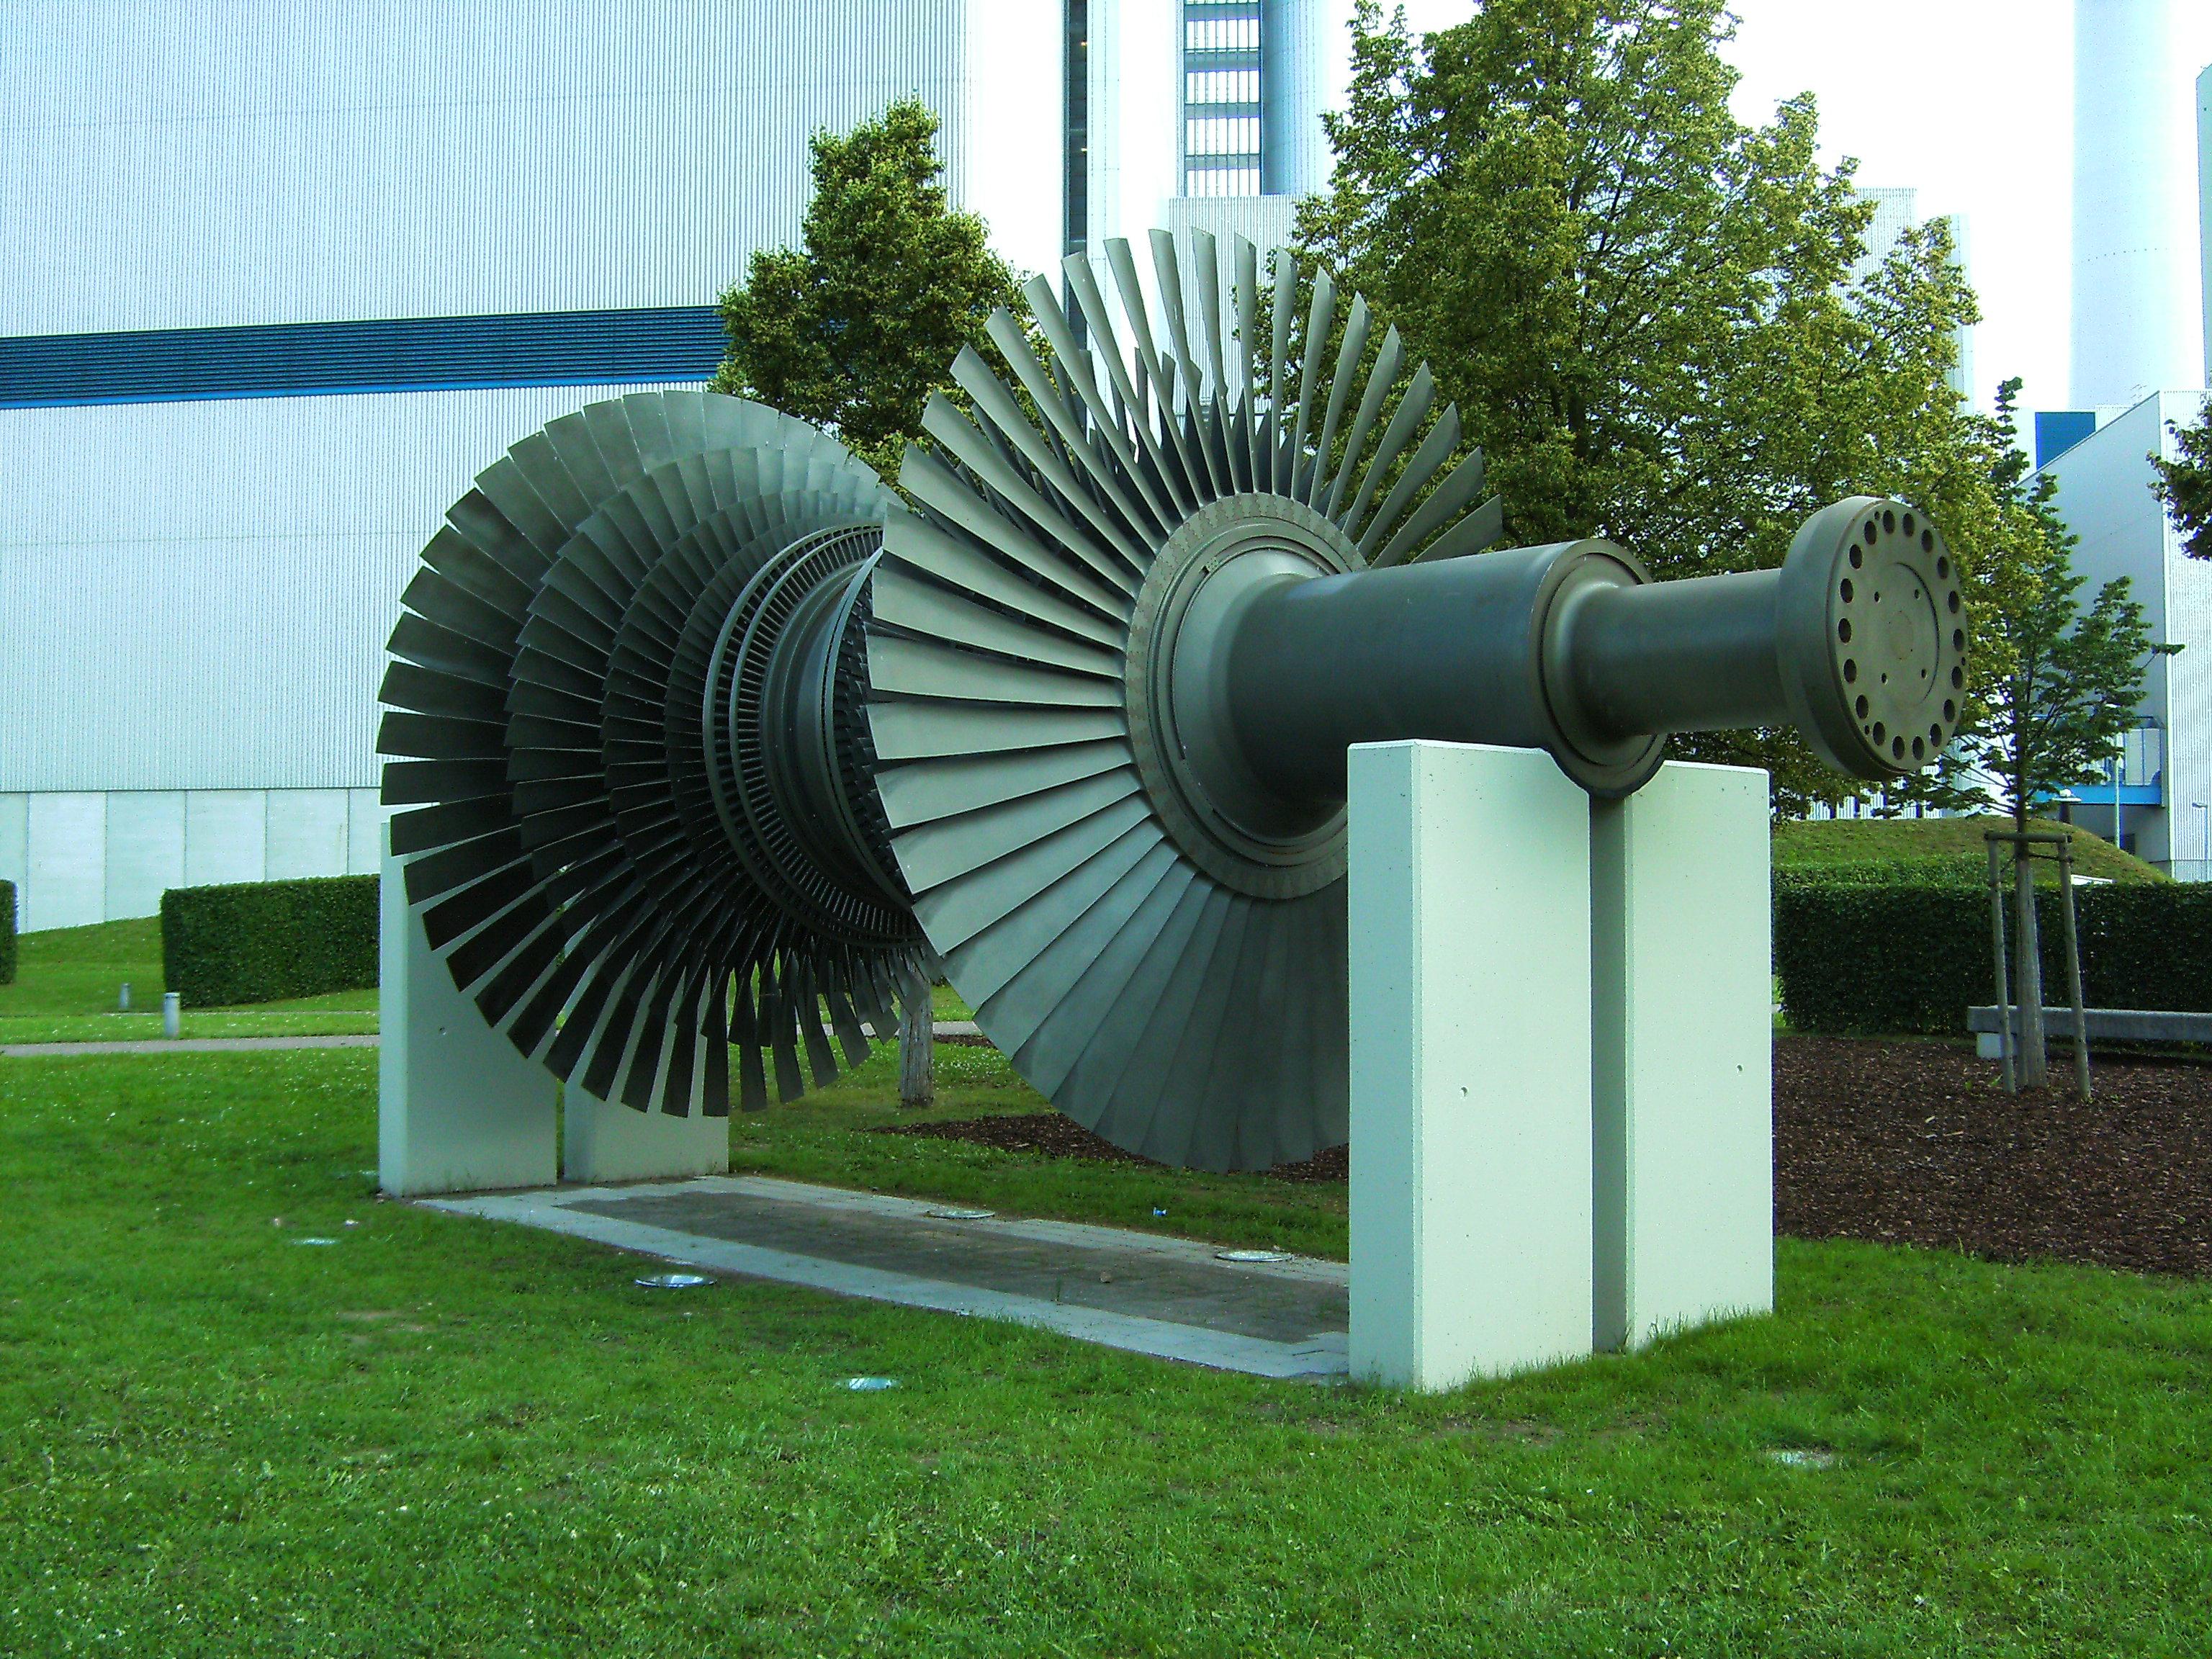 File Altbach Power Plant Turbine on display JPG Wikimedia mons